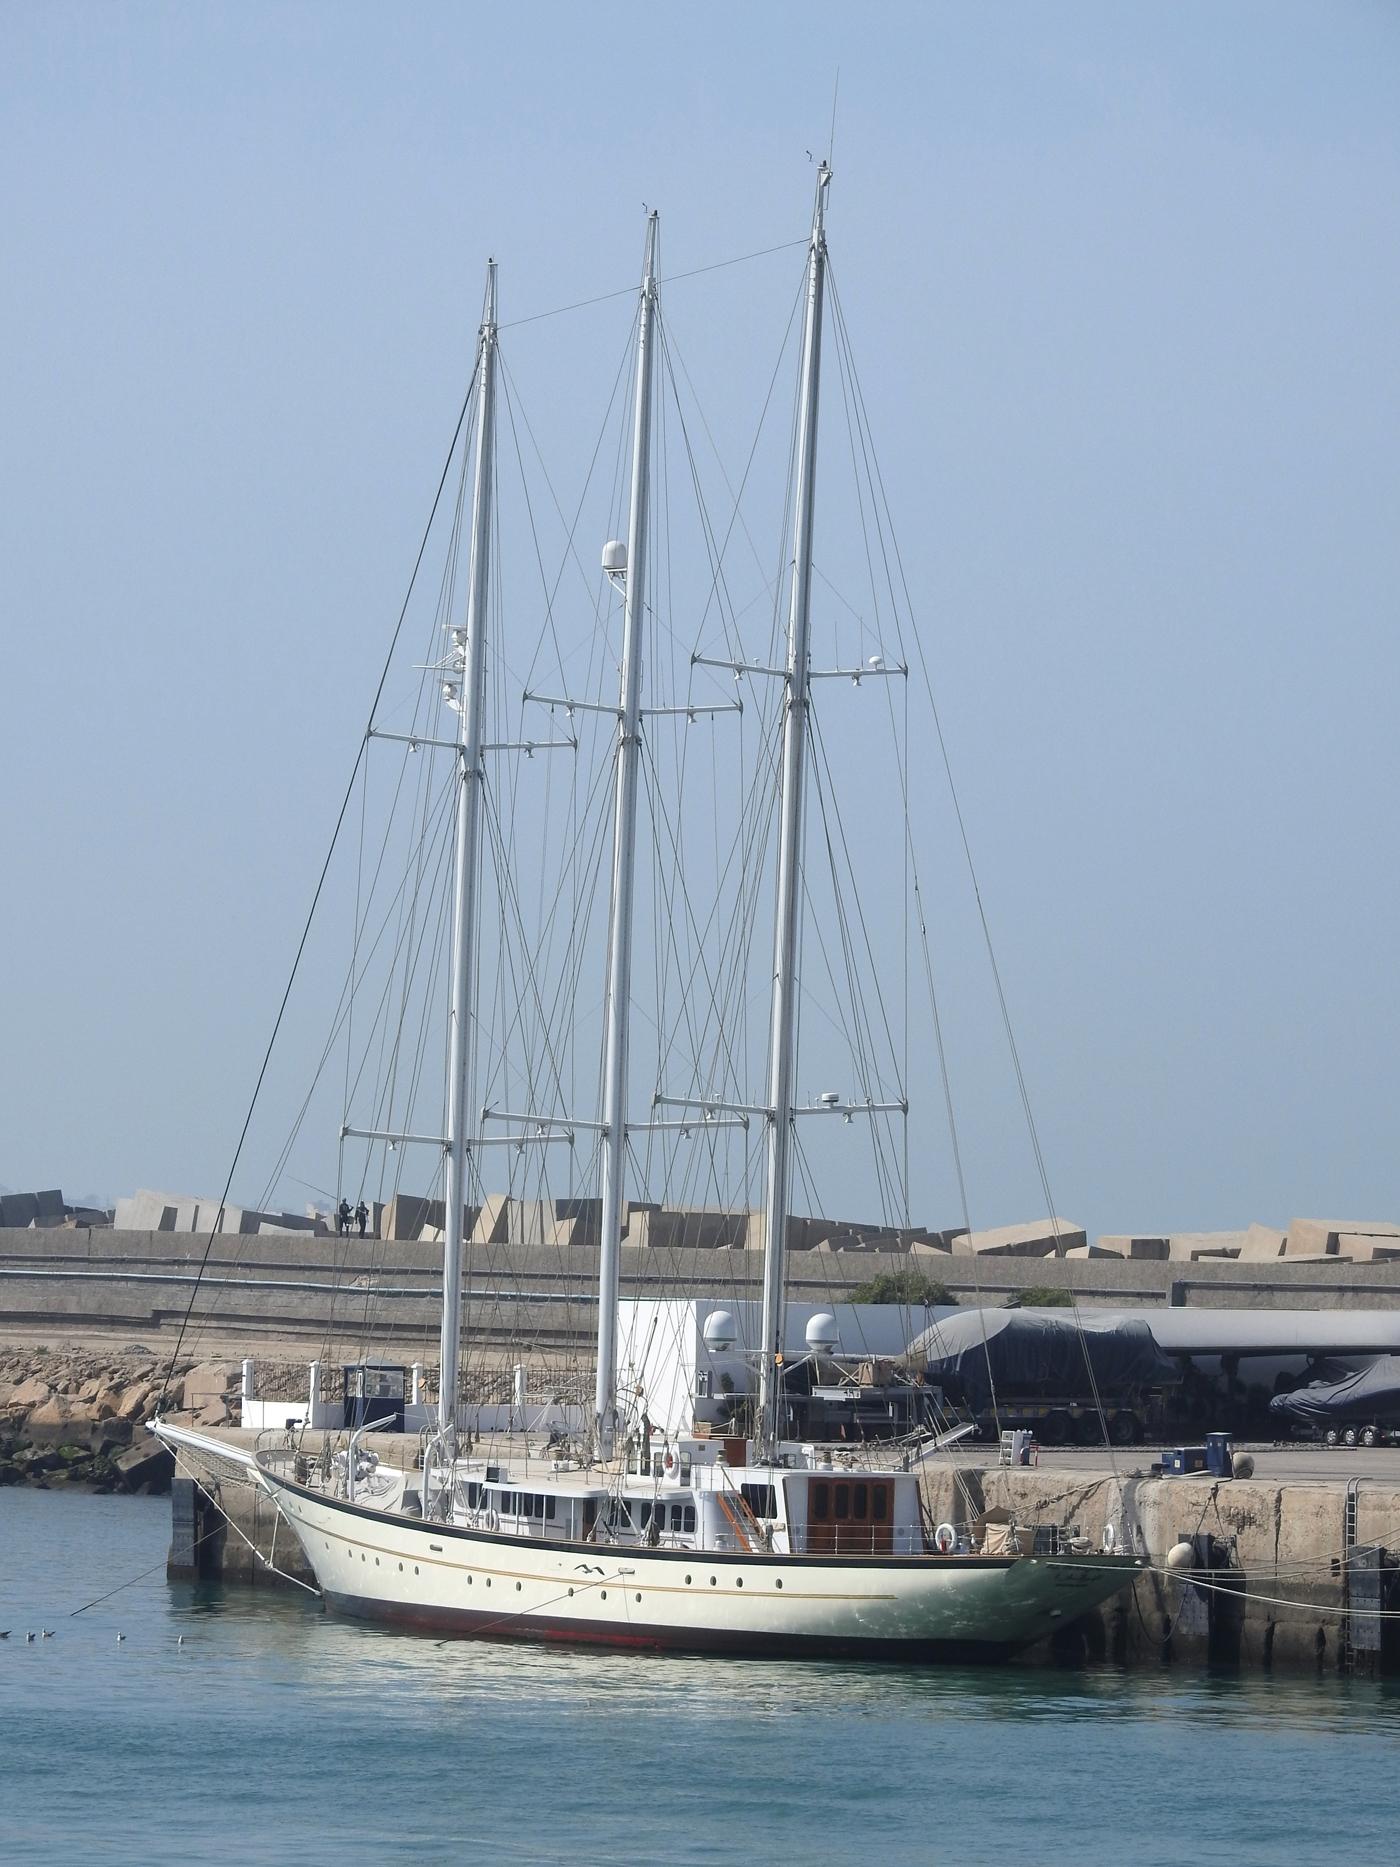 la flotte des Yachts Royals : El Boughaz I - Badis 1 - Page 2 3006109